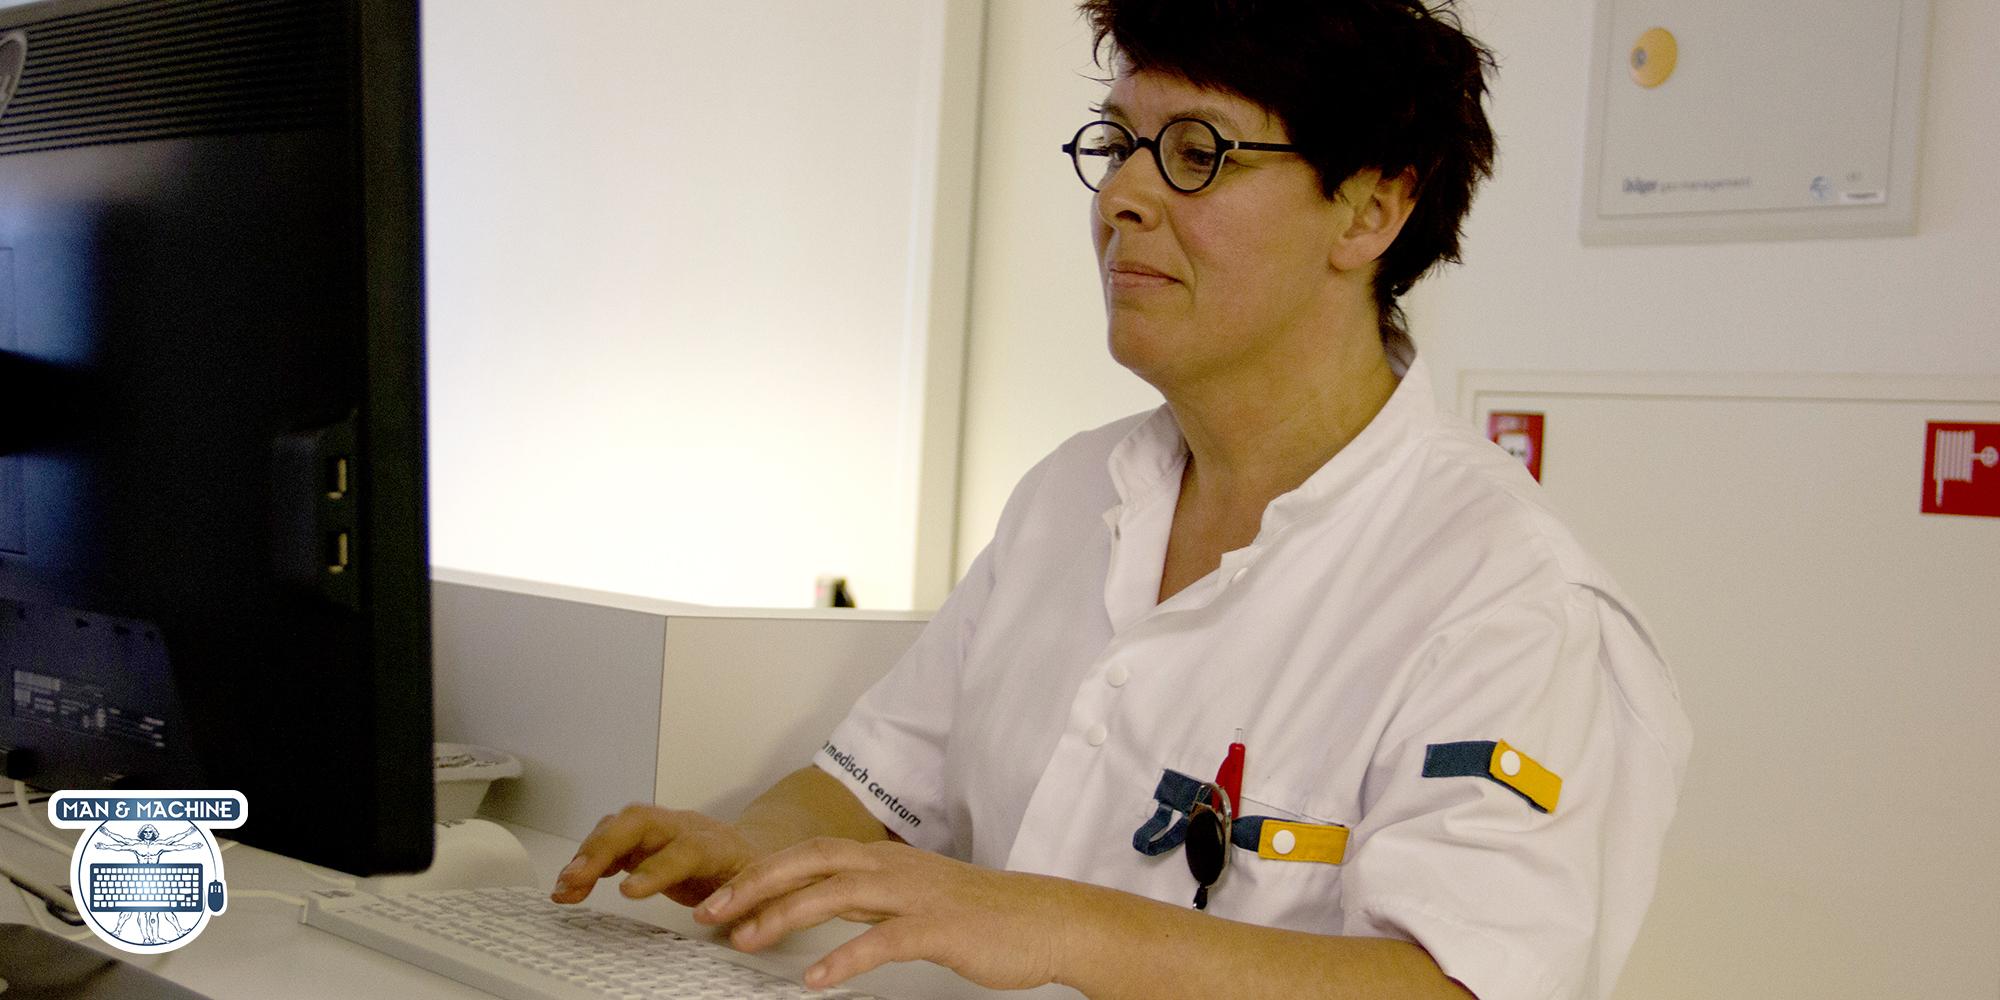 Man & Machine REALLYCOOL klinisk tastatur - medarbejder som arbejder